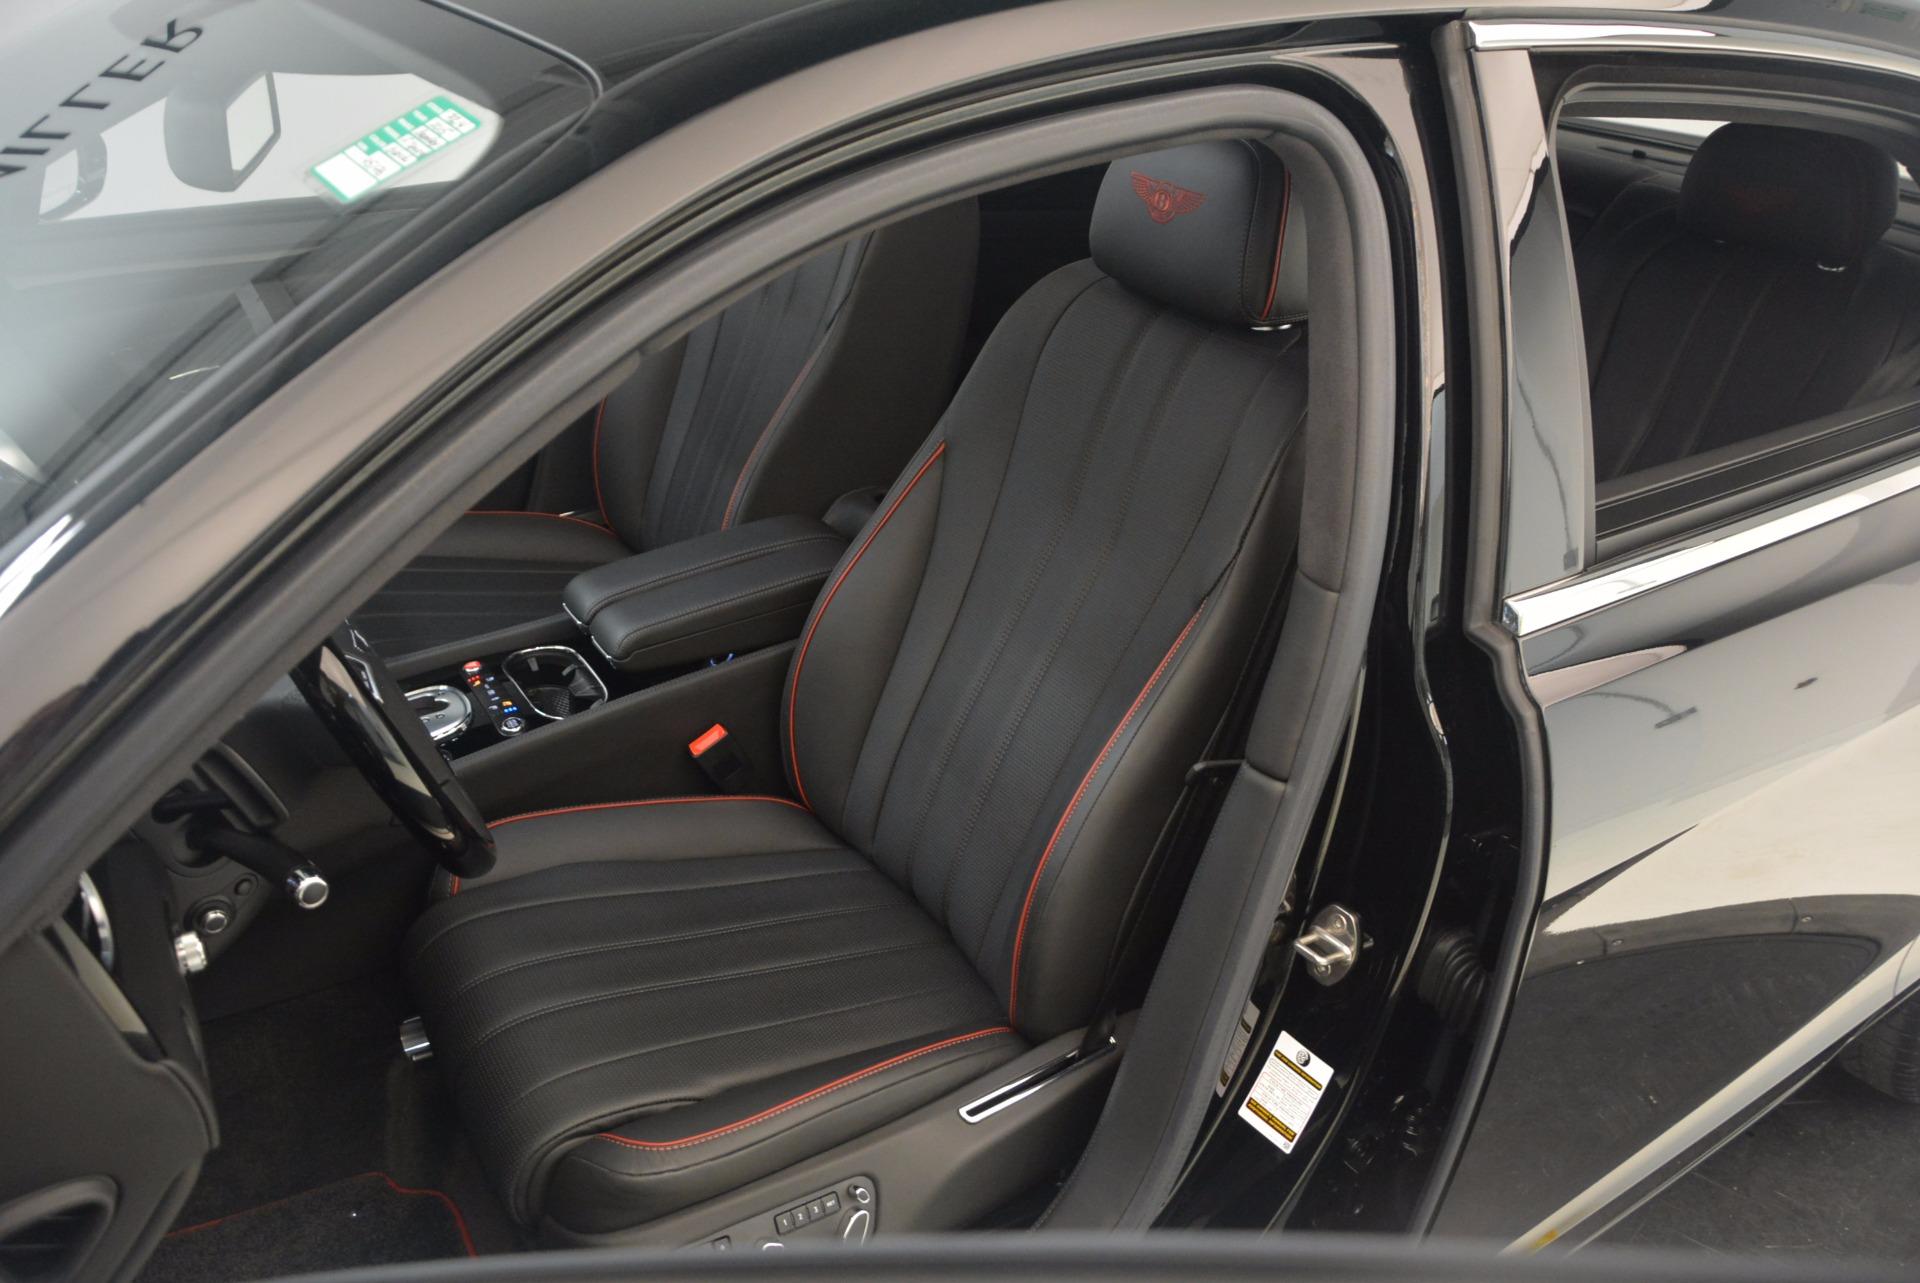 Used 2015 Bentley Flying Spur V8 For Sale In Westport, CT 1199_p24